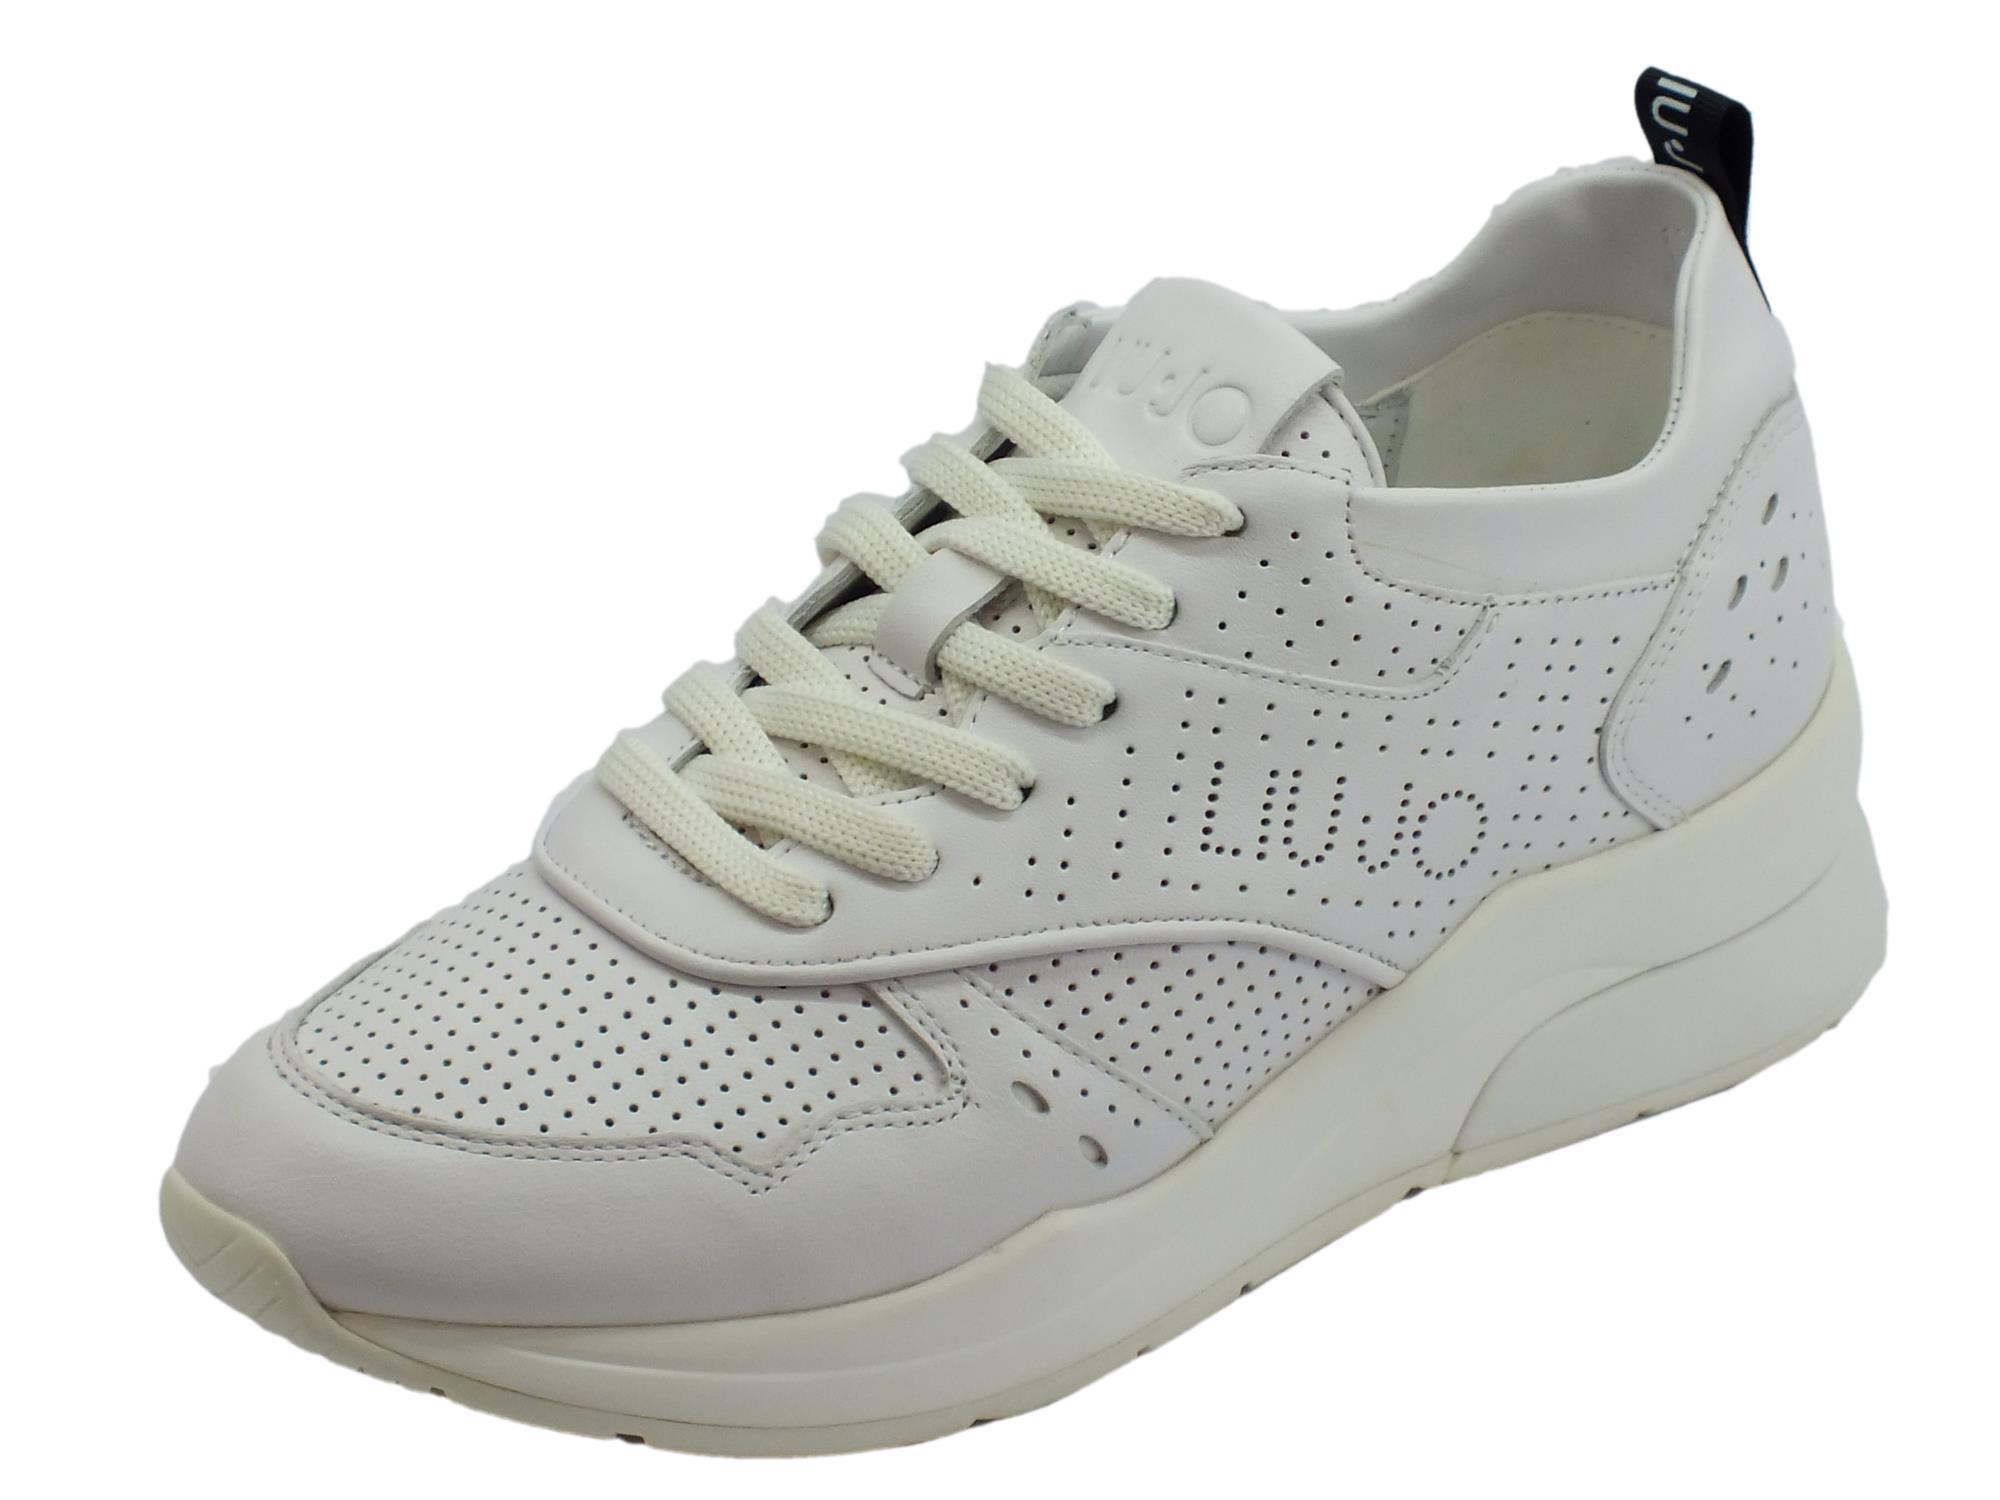 Sneakers Karlie LIU-JO donna pelle bianca zeppa alta - Vitiello ... 82710f0686c